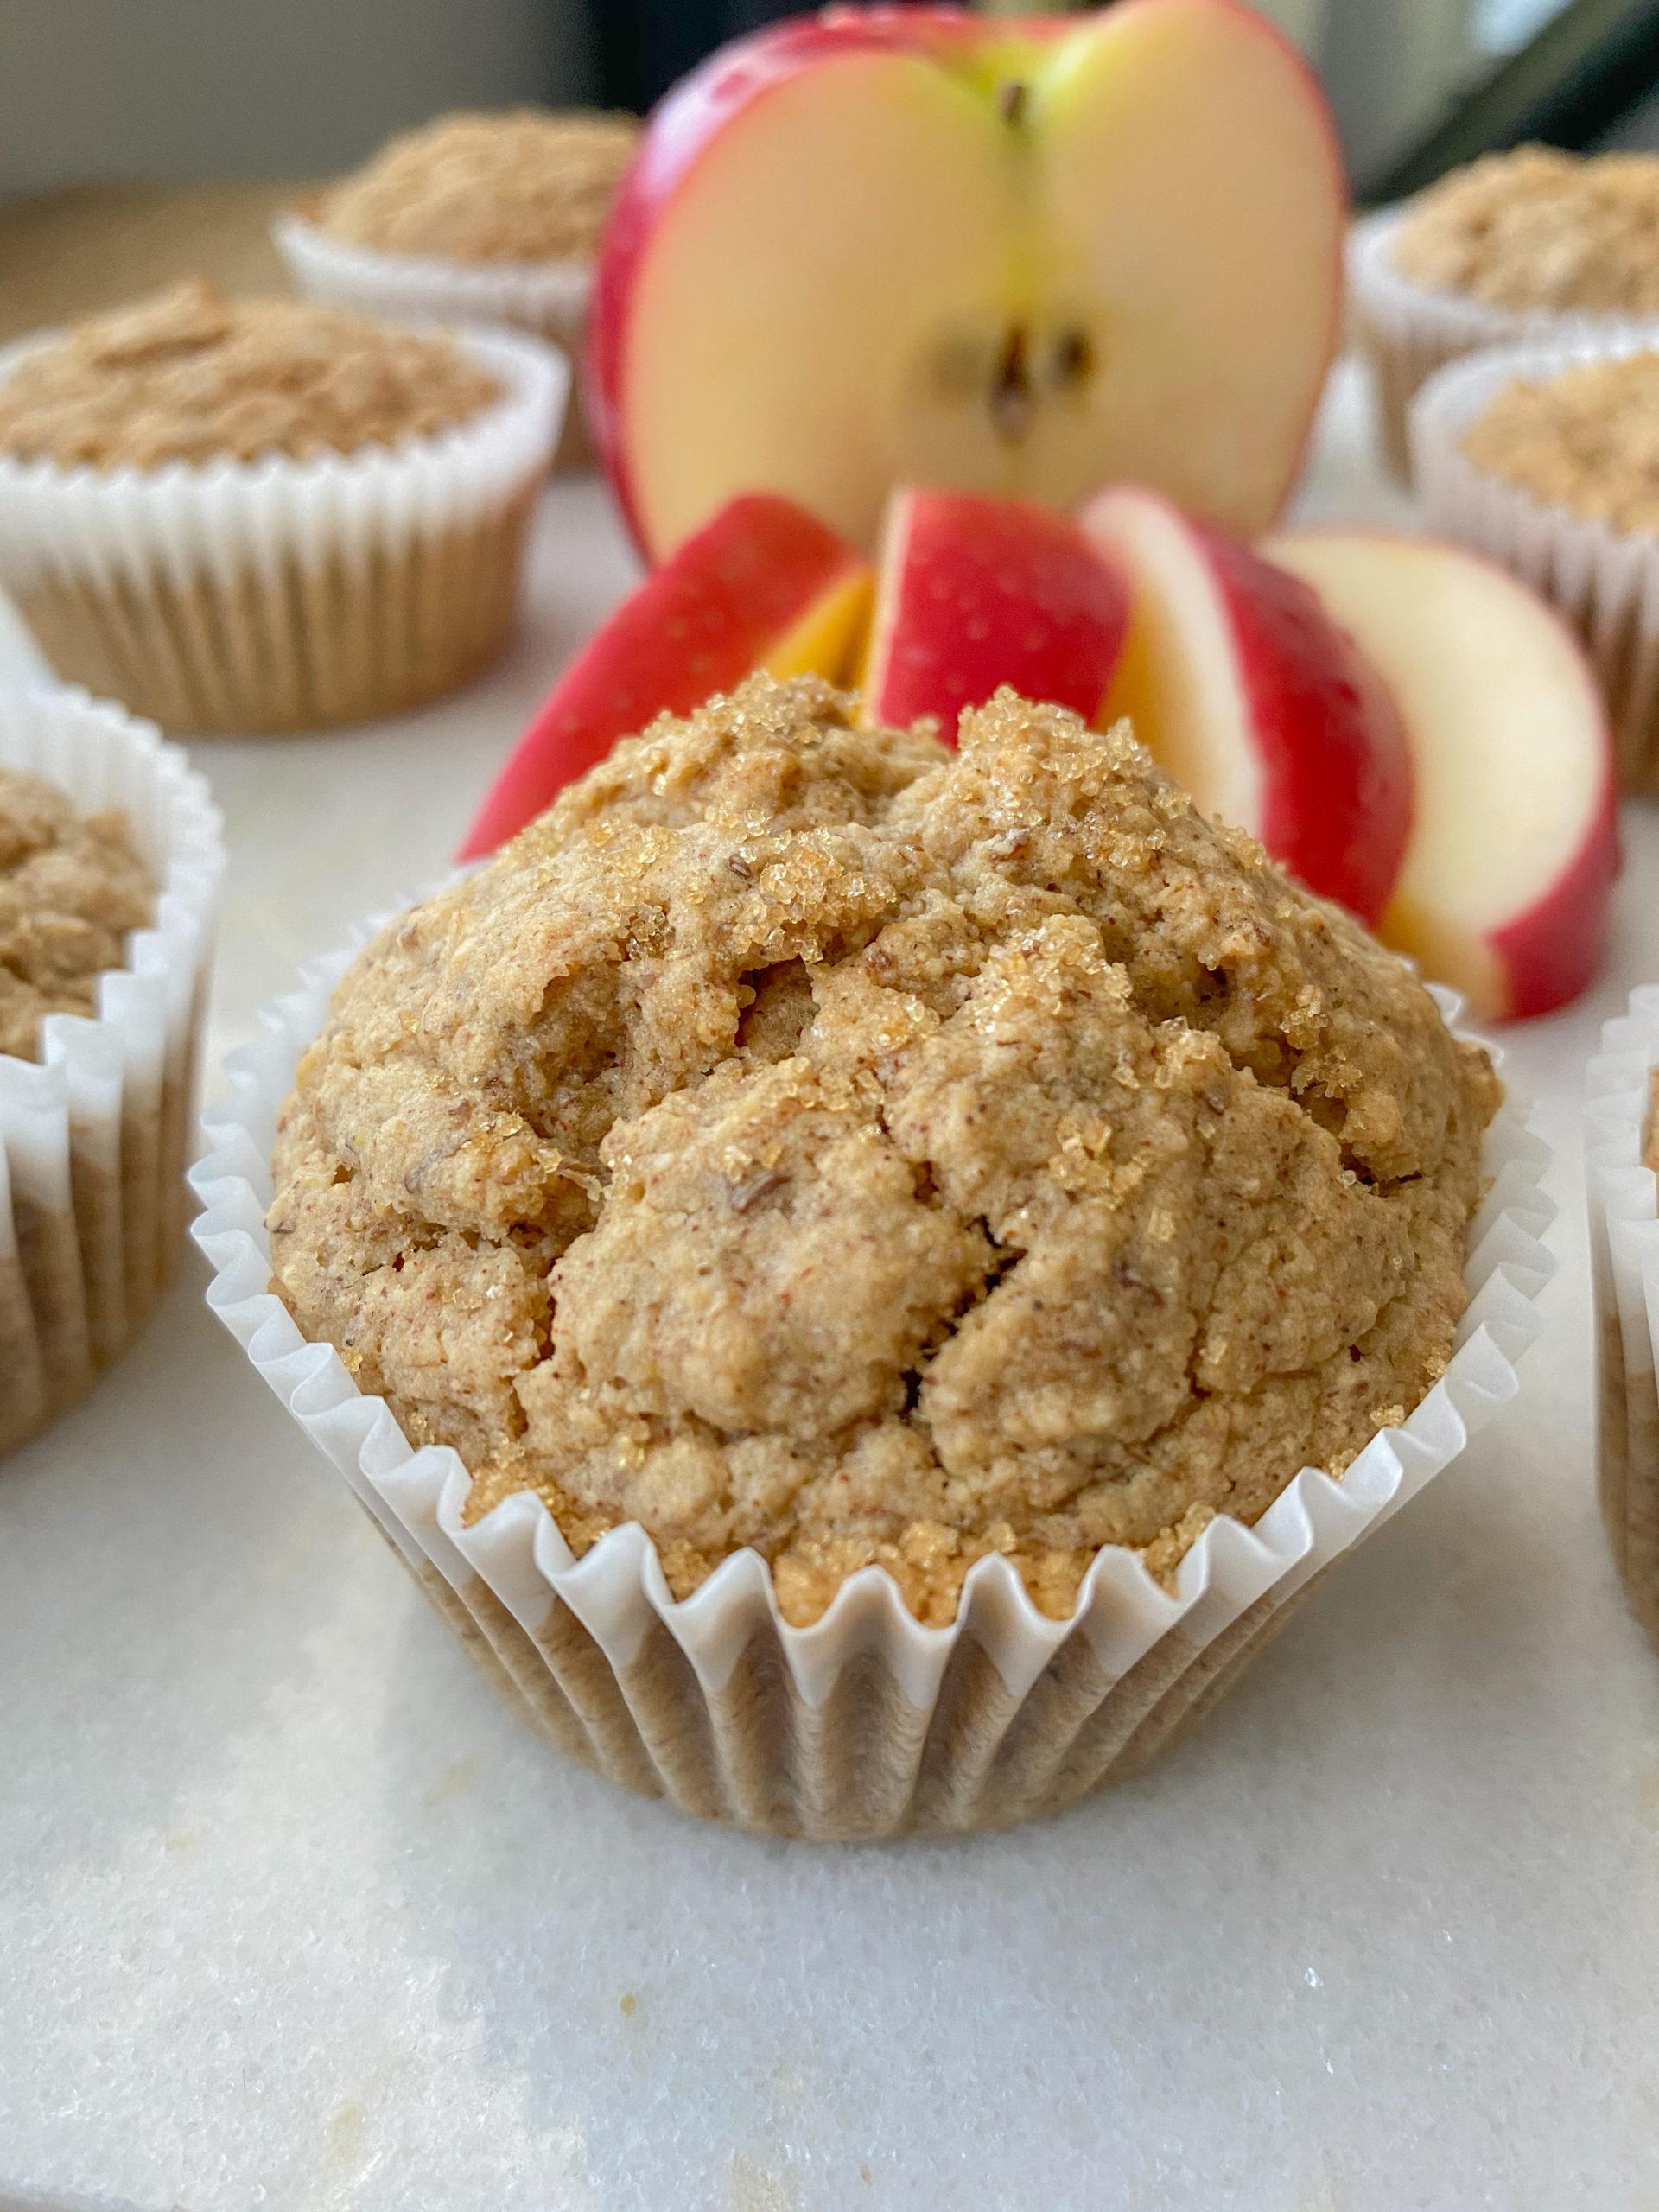 Fluffy Gluten Free Apple Cinnamon Oatmeal Muffins